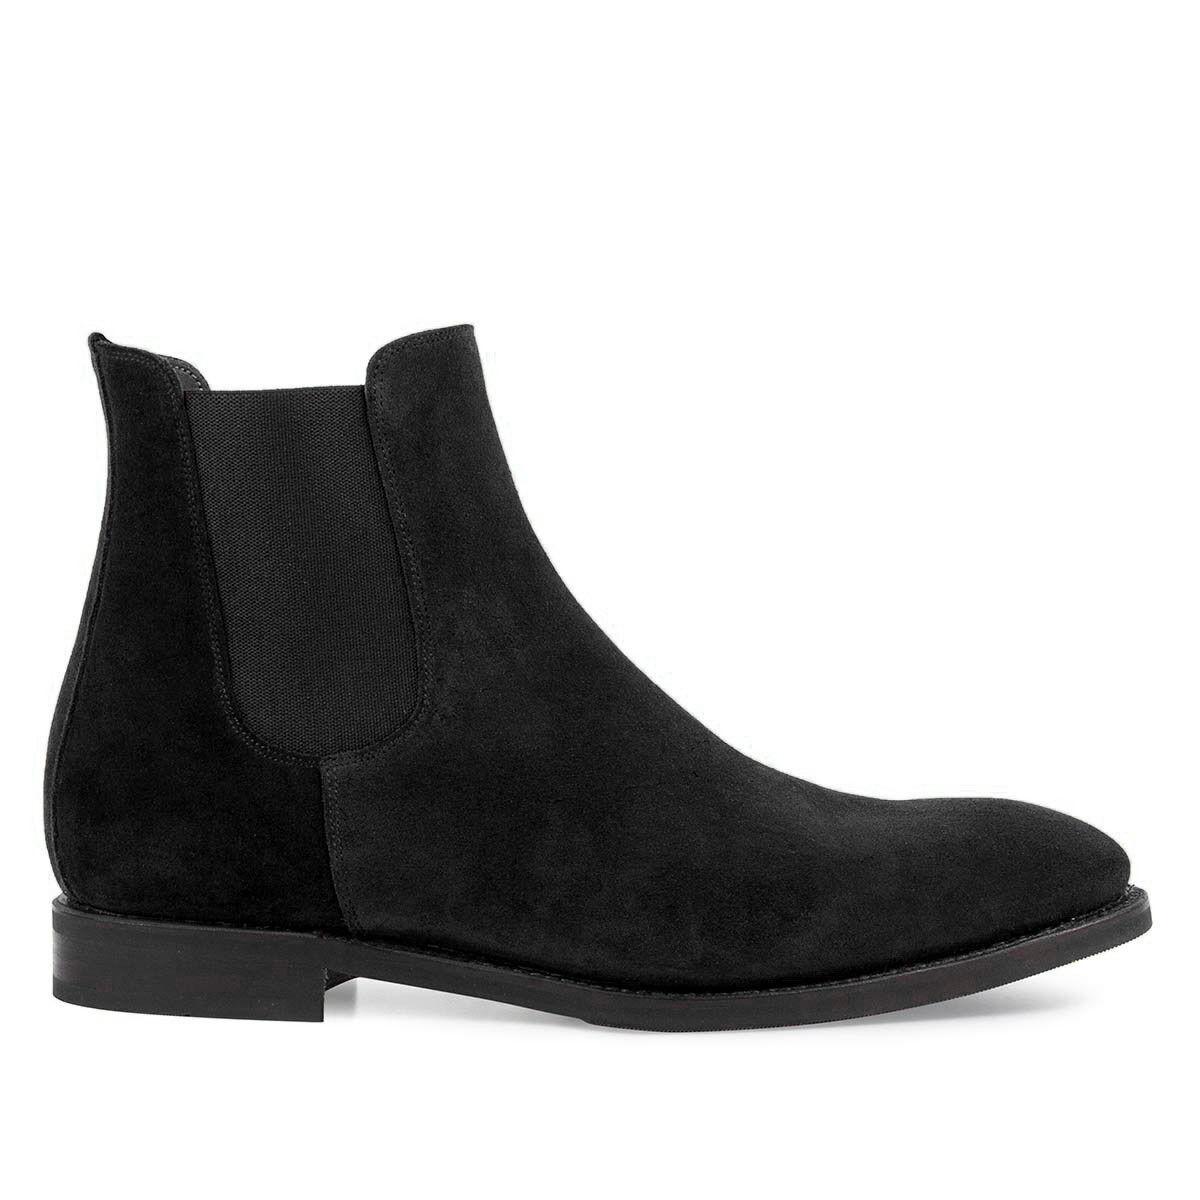 Handmade Suede Chelsea Leather Stiefel for men men men Dress Business Office casual schuhe 02e886